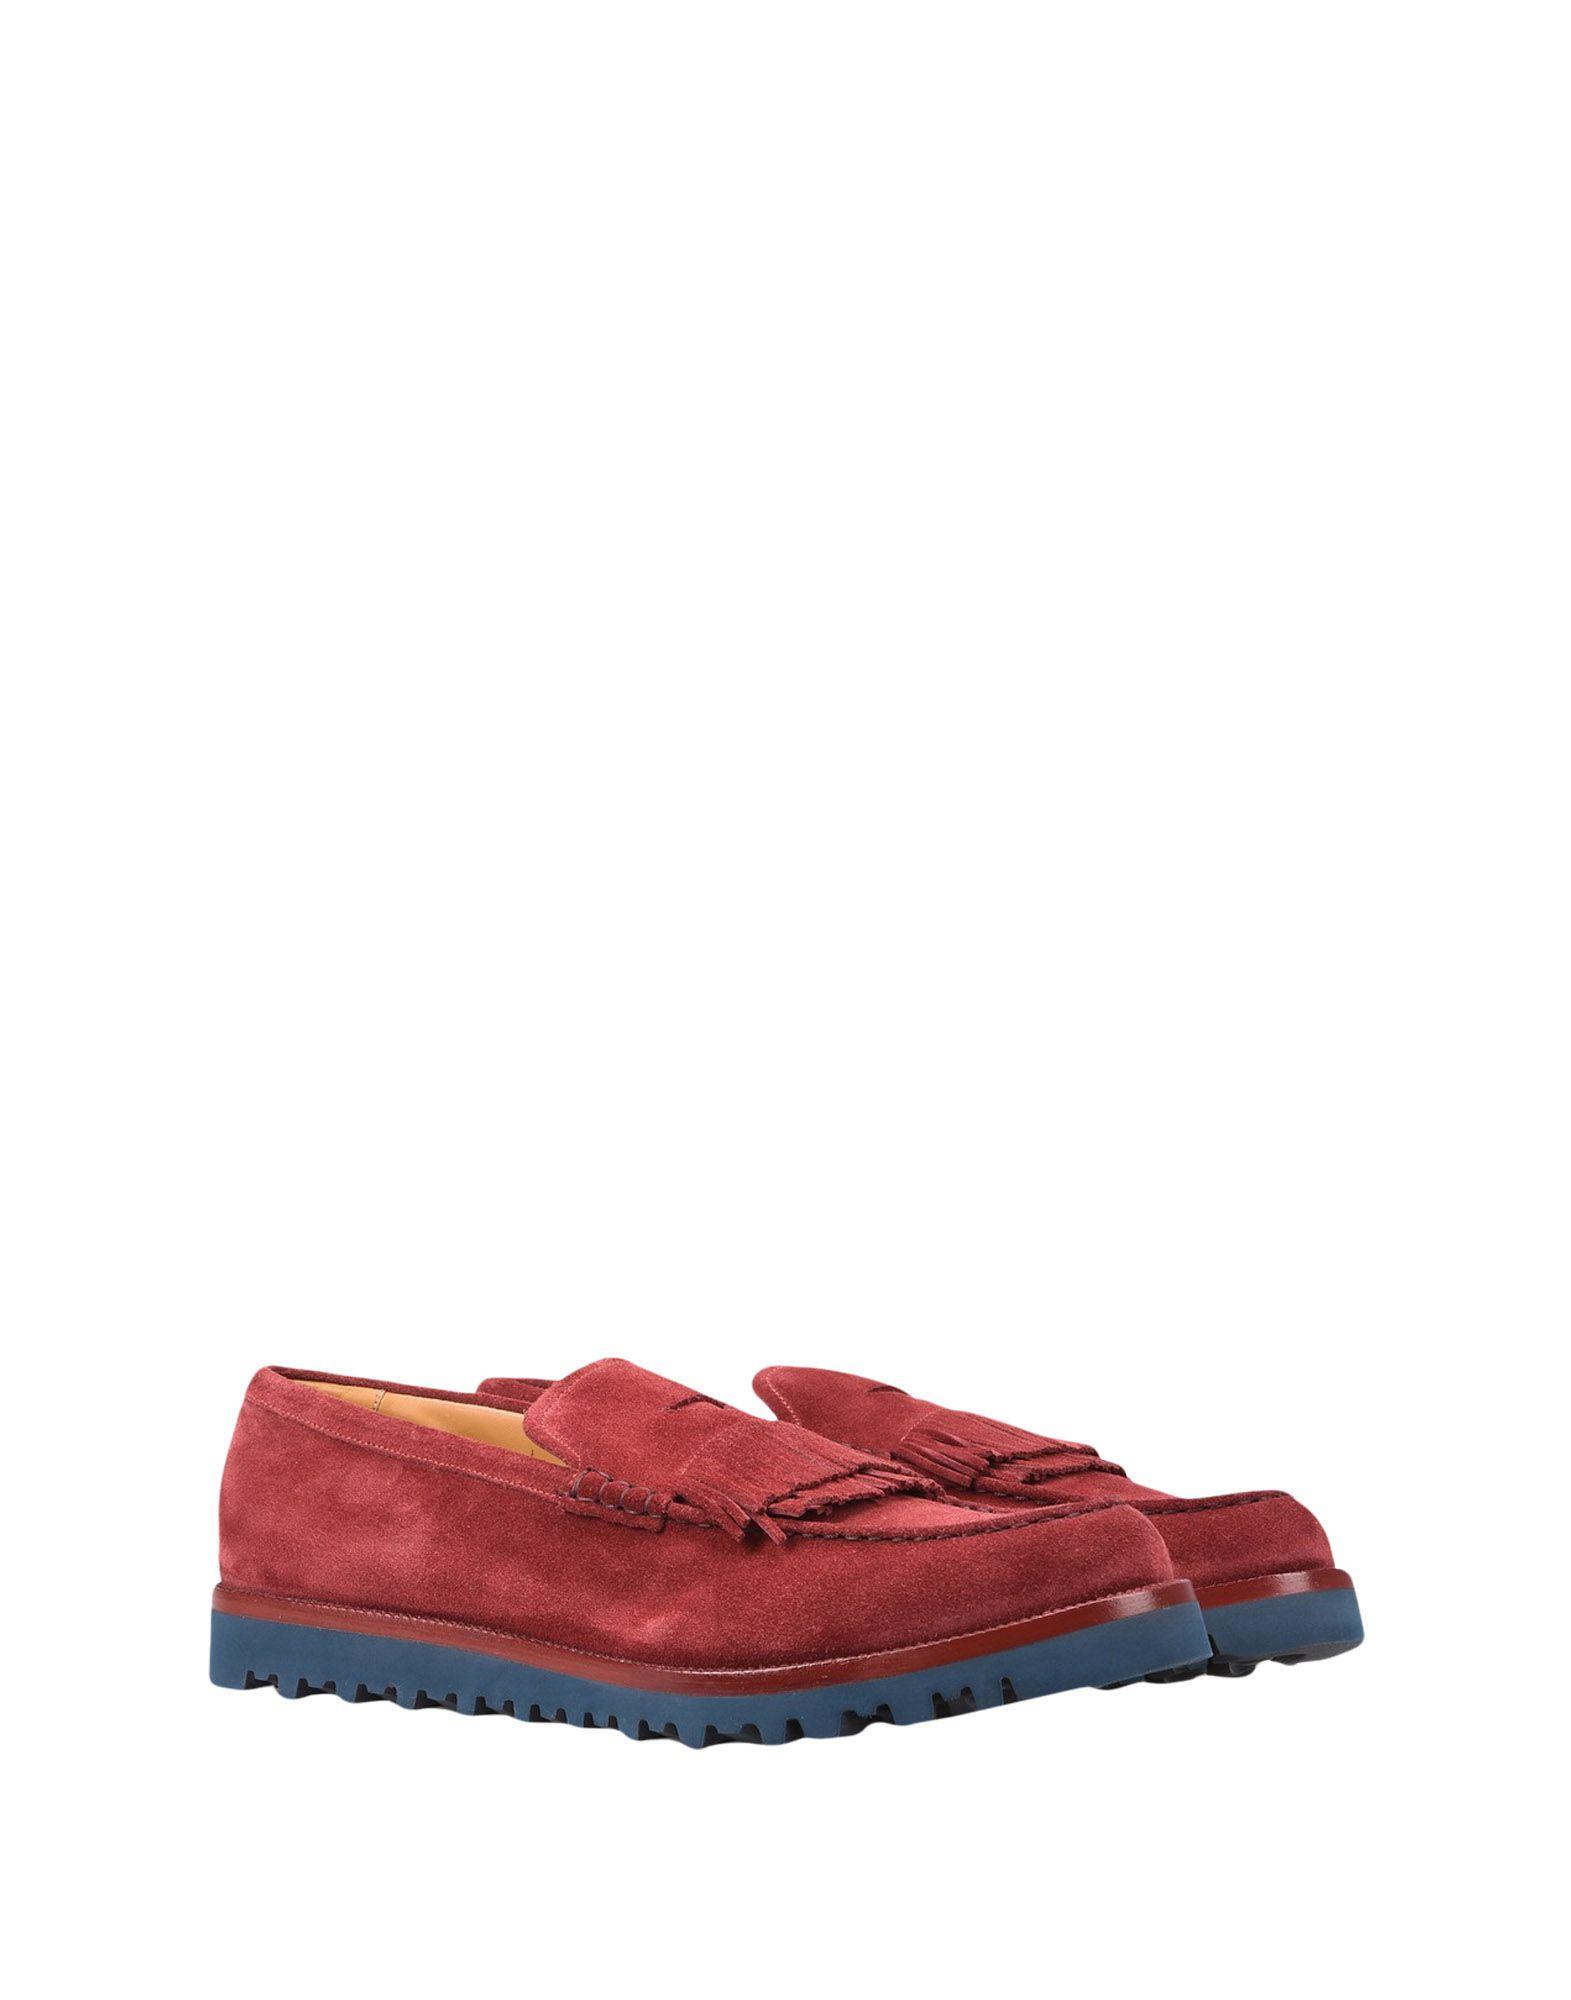 Giorgio Armani Mokassins Herren  11444348BU Gute Qualität beliebte Schuhe